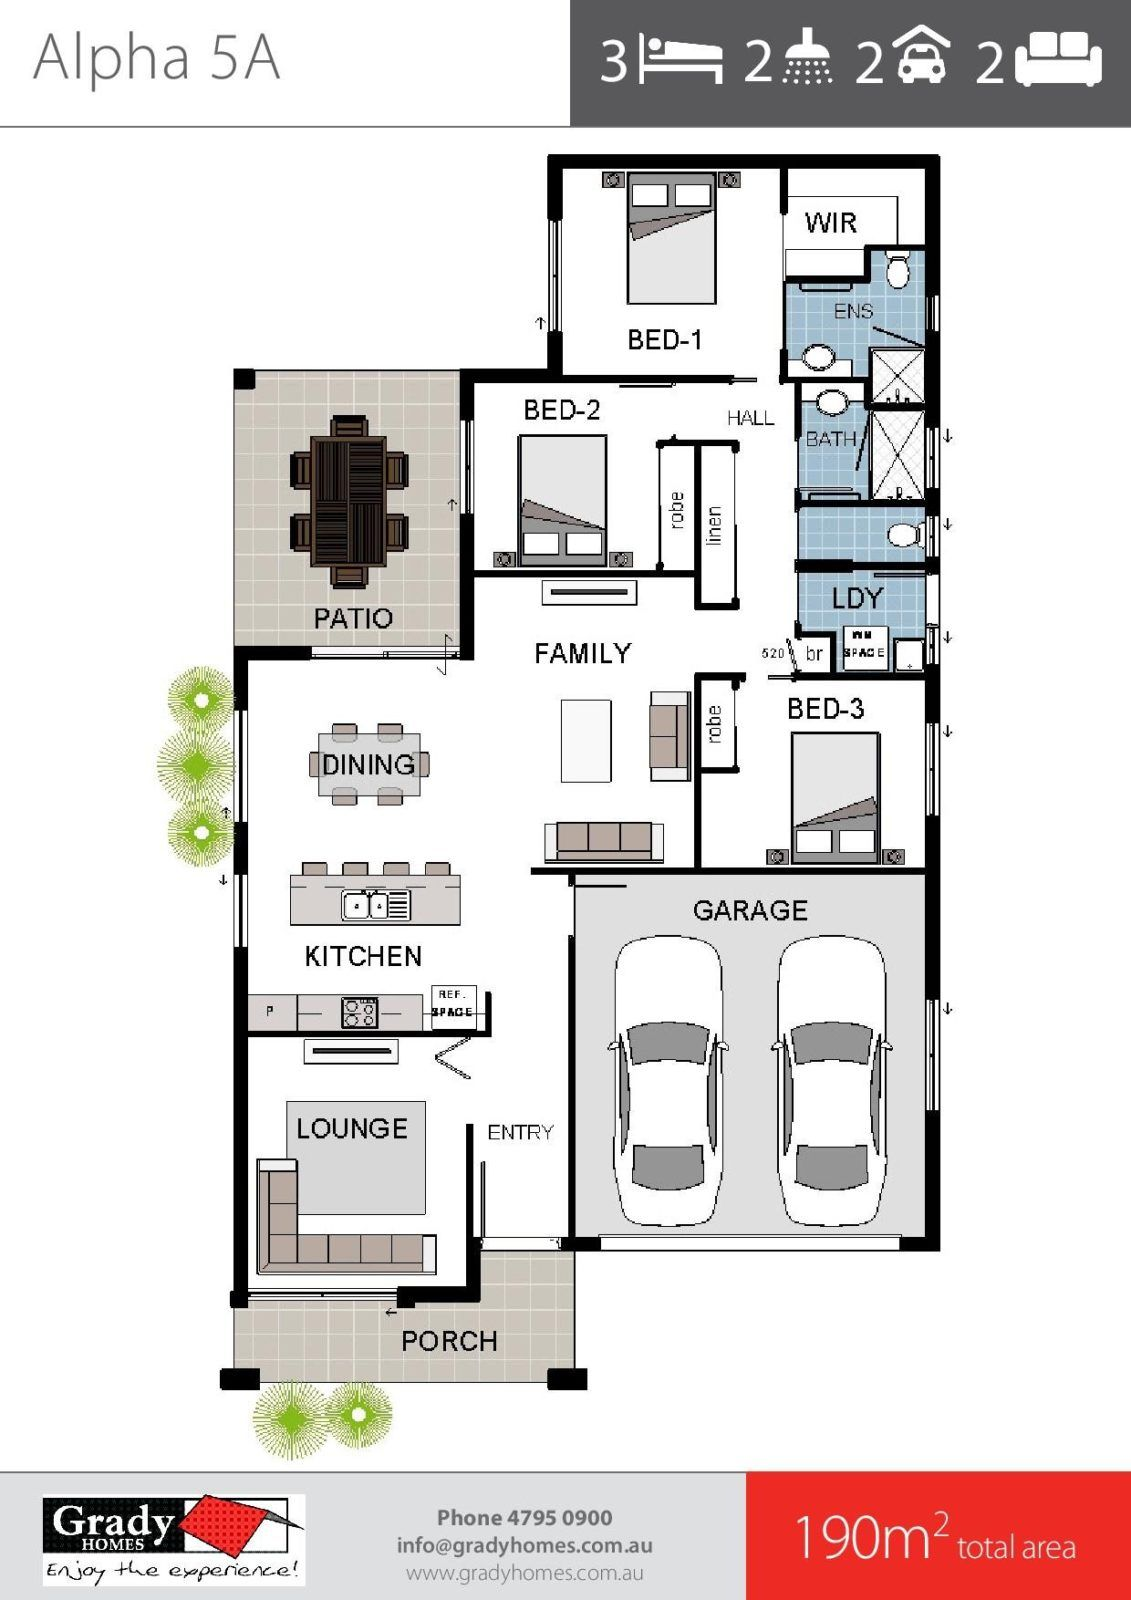 12 Popular Floor Plans Of 2018 Grady Homes Townsville Builder Solar House Plans Home Design Floor Plans House Plans